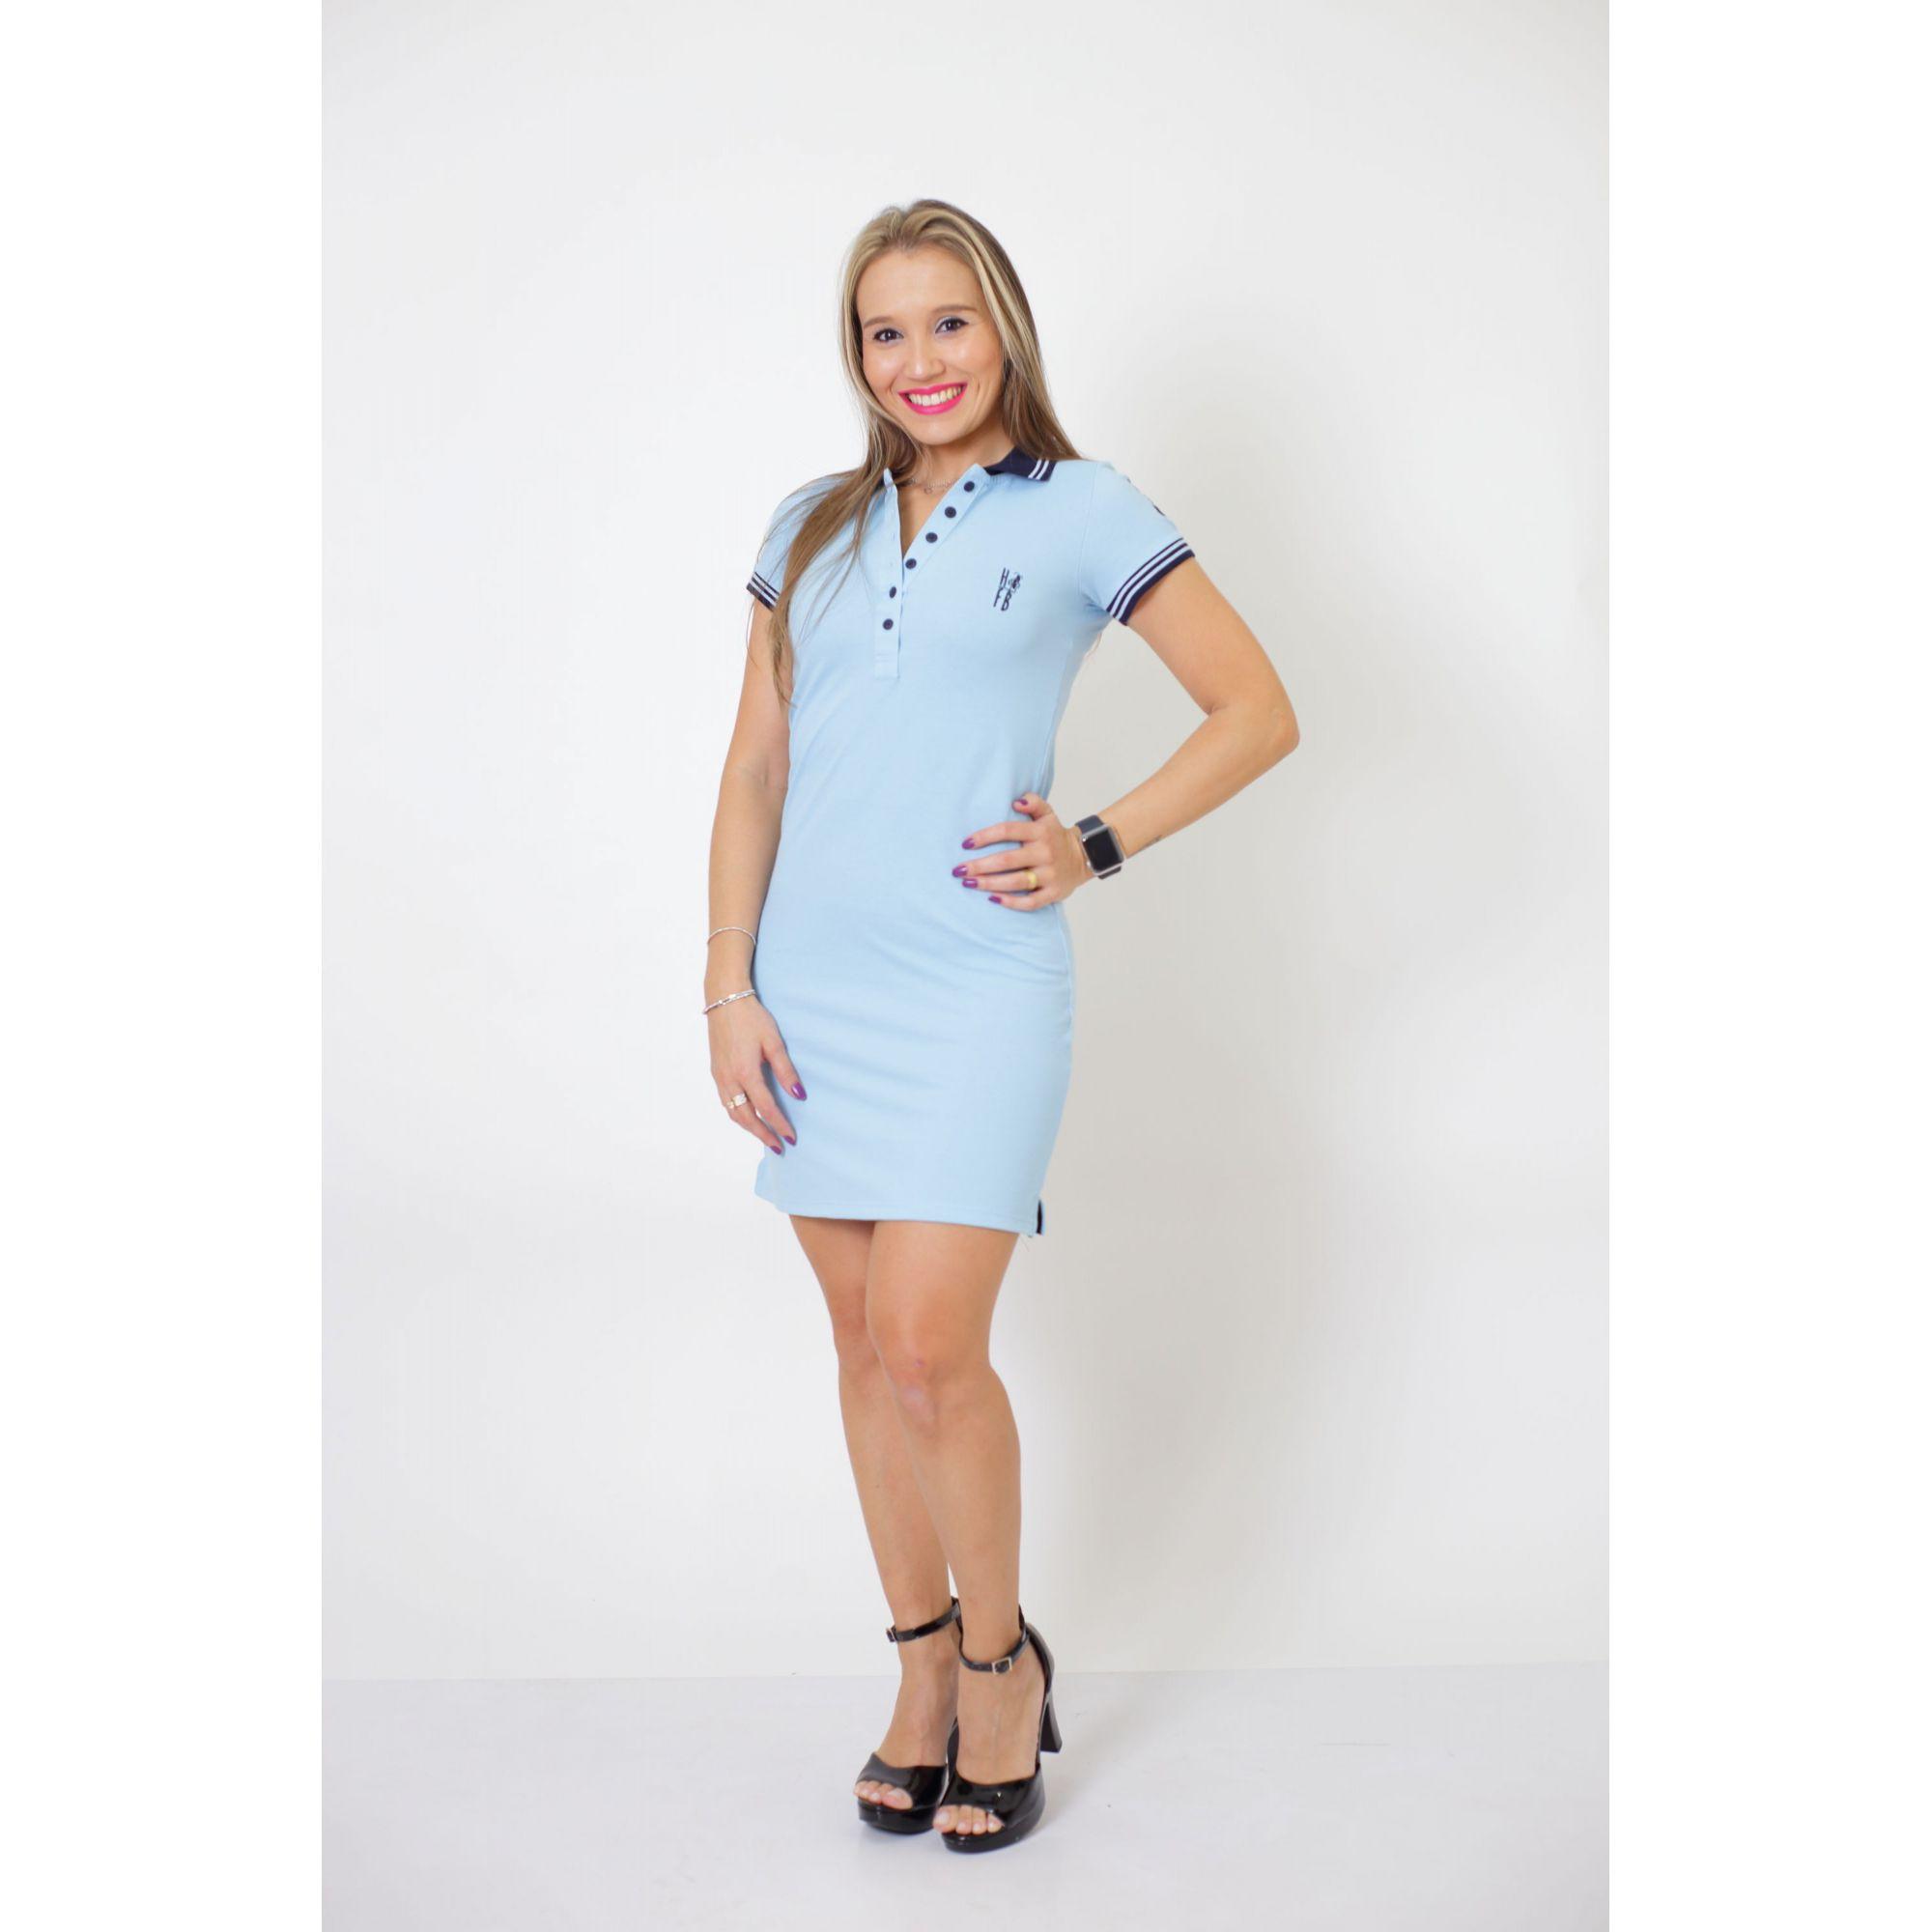 MÃE E FILHA > Kit 02 Vestidos Polo Azul Nobreza [Coleção Tal Mãe Tal Filha]  - Heitor Fashion Brazil